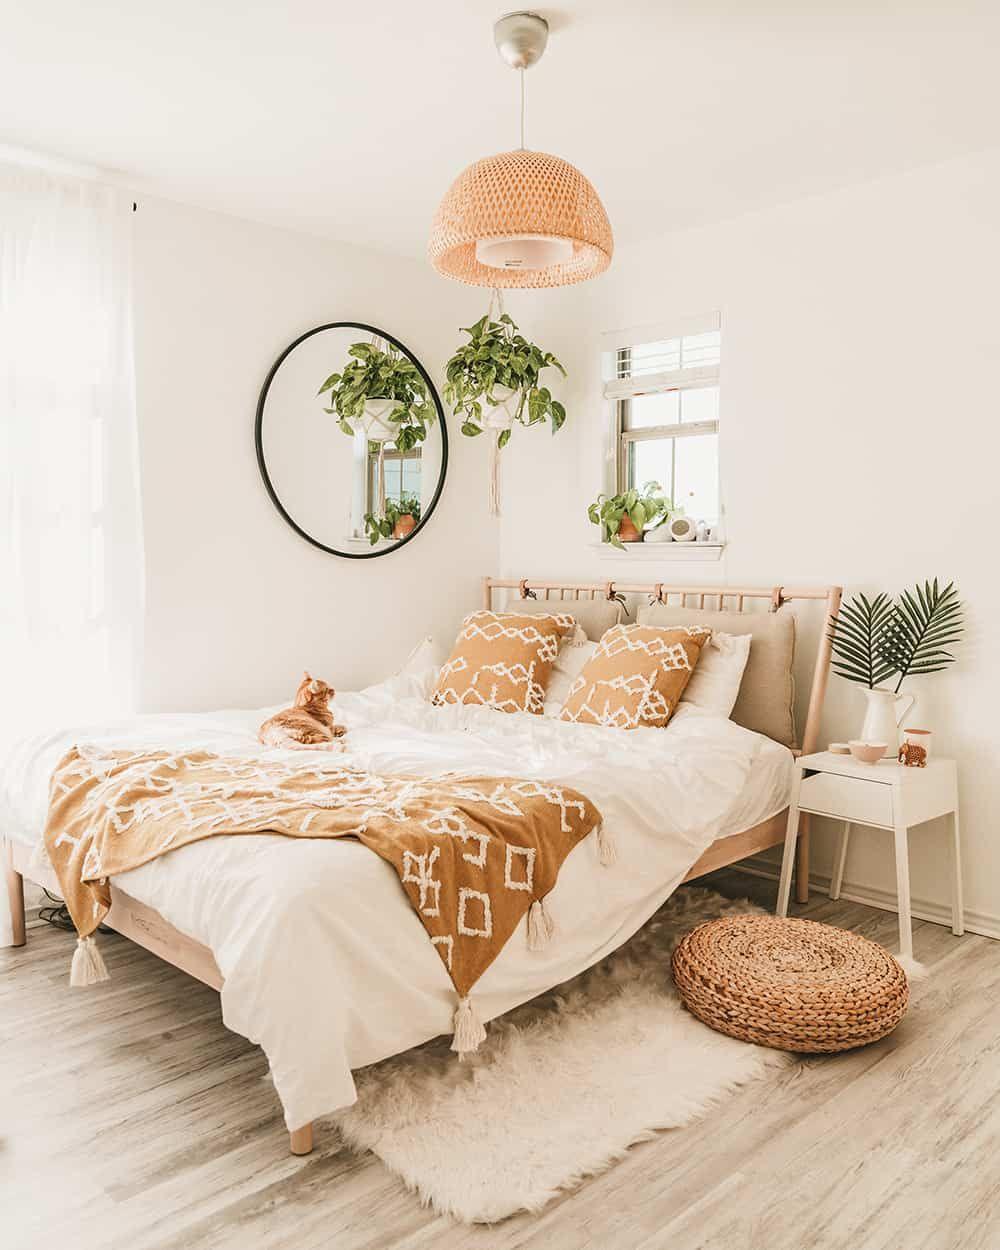 Ikea Bedroom Makeover For Under 600 Bedroom Decor Room Decor Bedroom Room Inspiration Bedroom